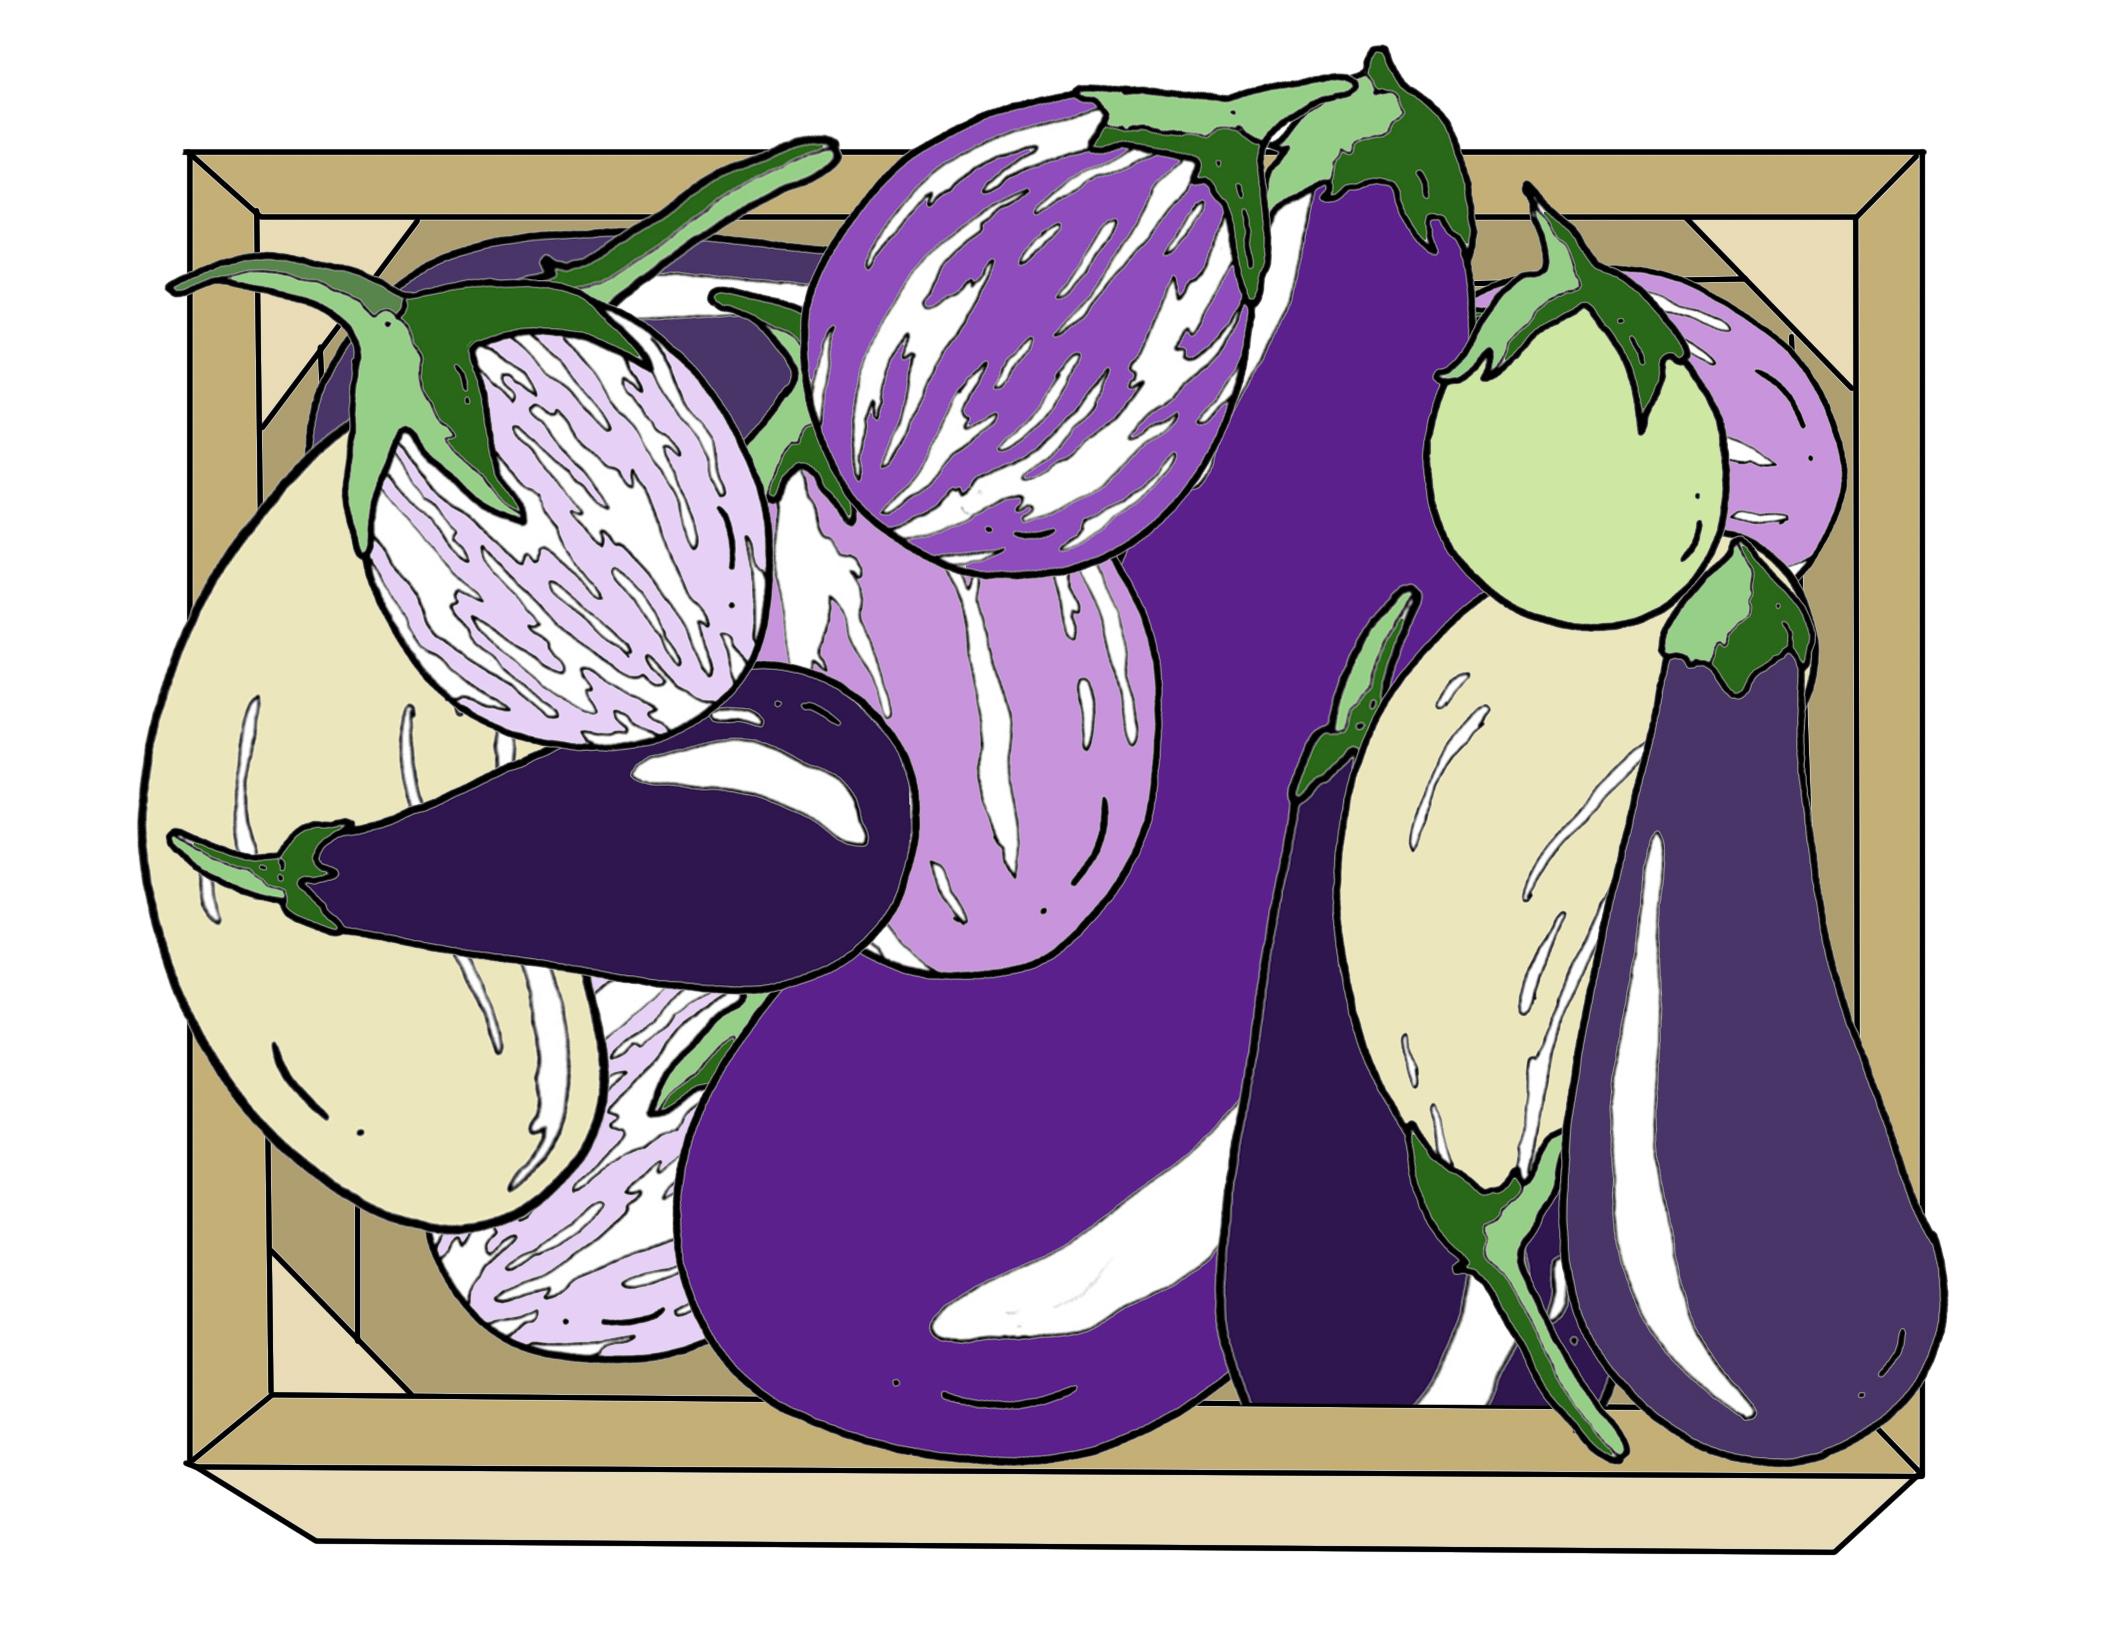 Eggplants in box edit.jpg